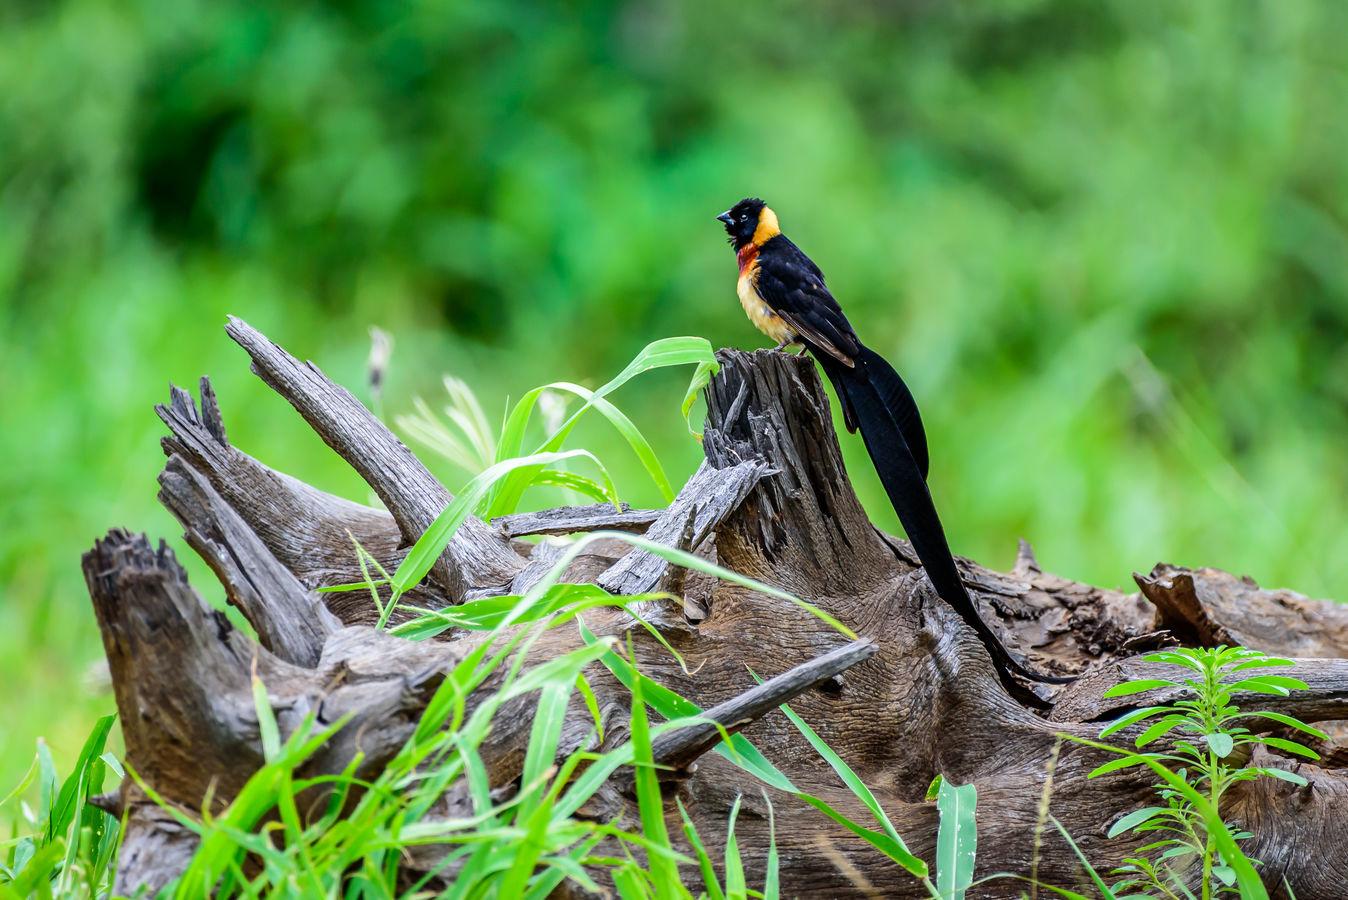 Vdovka rajská (Vidua paradisaea) - NP Kruger, Jihoafrická republika